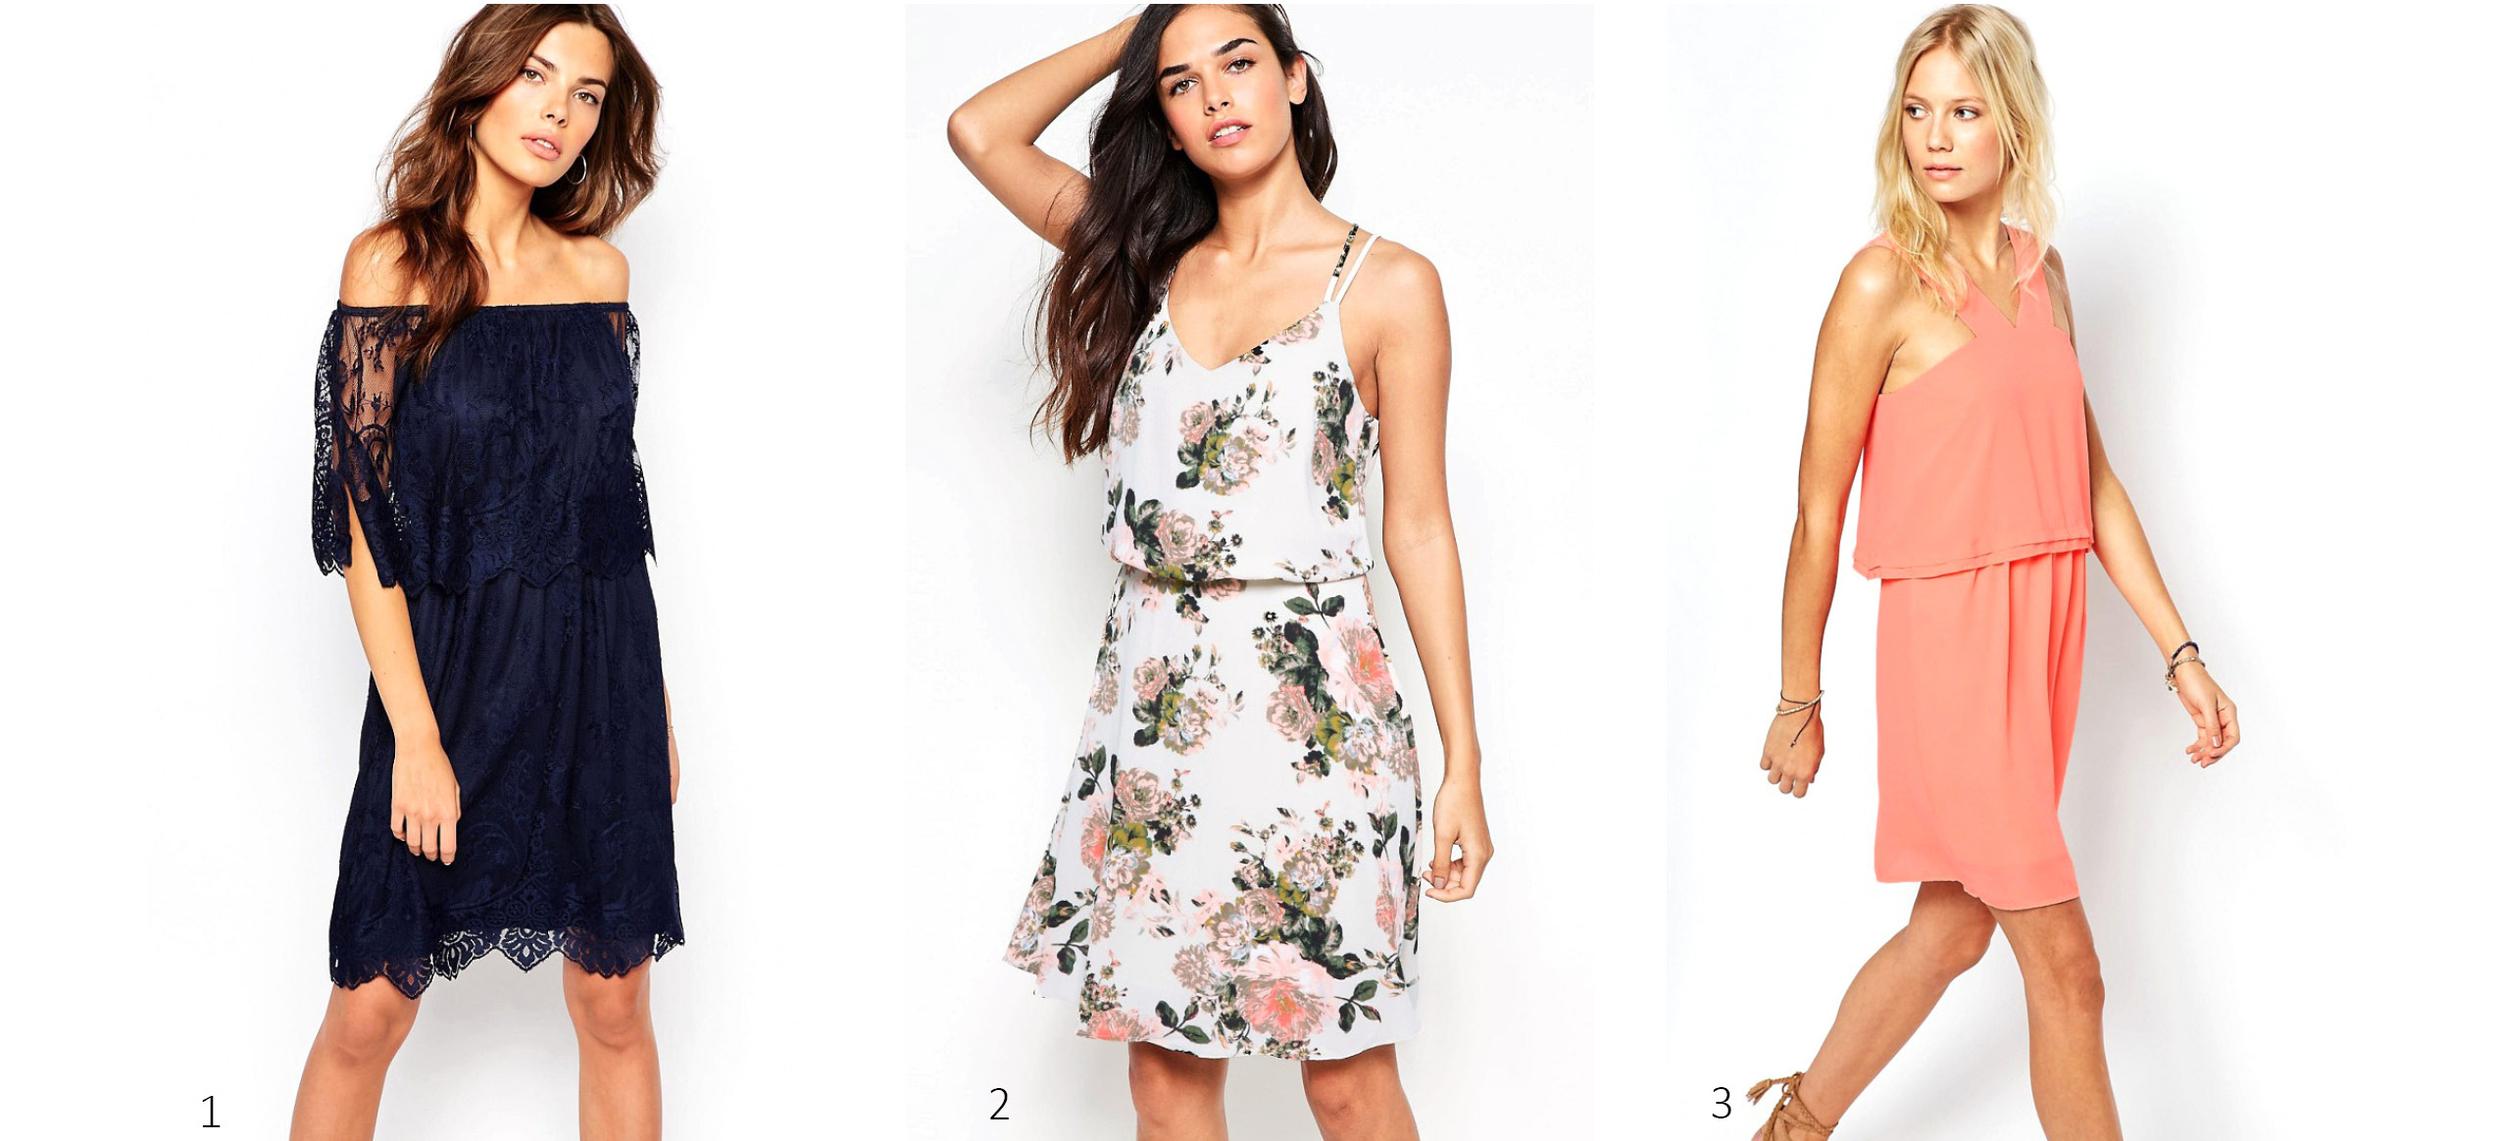 1. ASOS Vila Lace Bardot Double Layer Dress $52 ; 2. ASOS Vila Floral Cami Dress $62 ; 3. ASOS Vila Dress with Ruffle Detail $52